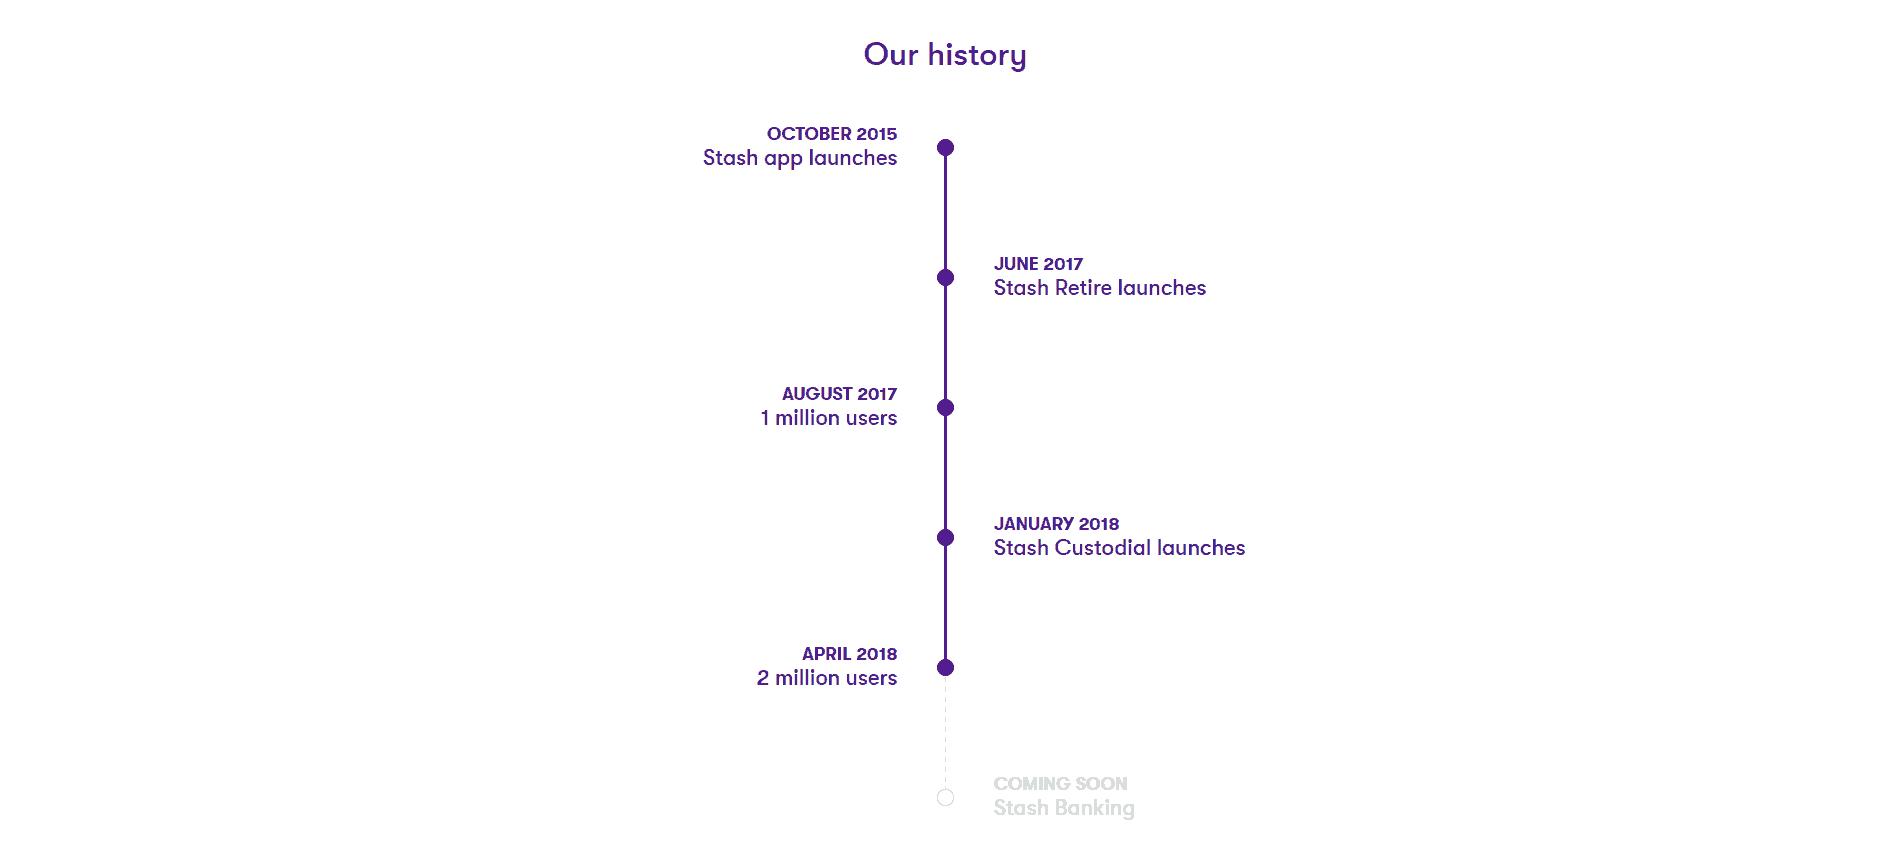 Stash history